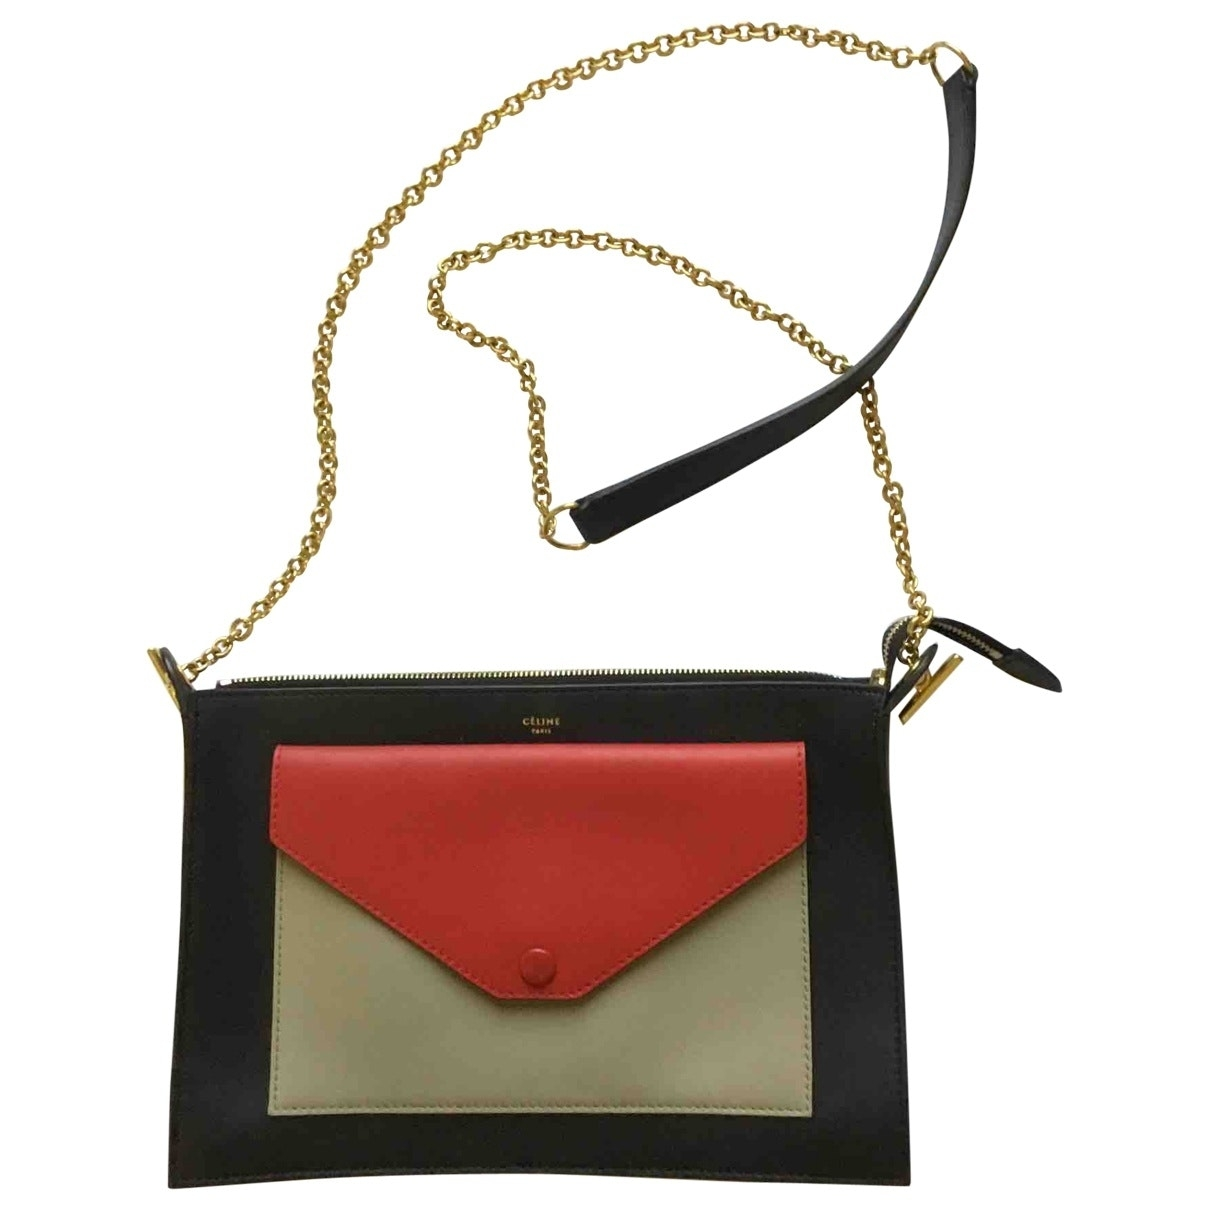 Celine \N Handtasche in  Bunt Leder